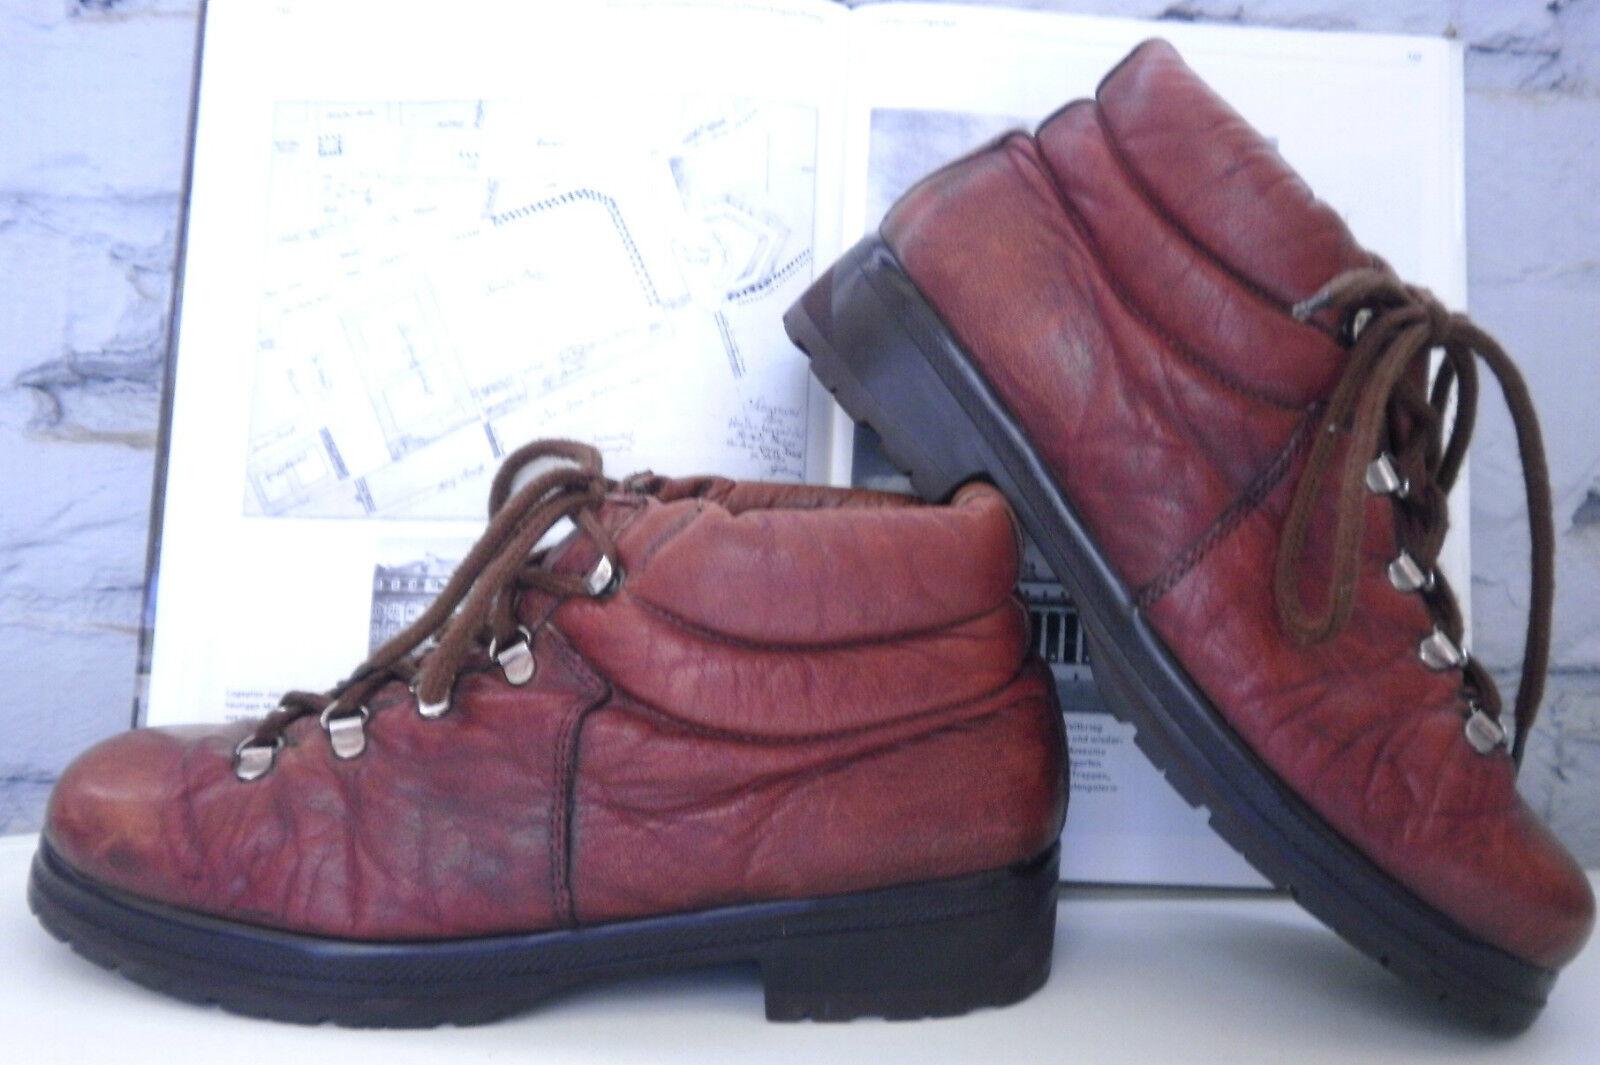 Schnürschuhe Boots Wilhelm Jordan Germany TRUE VINTAGE Wandern Trekking  Schuhe